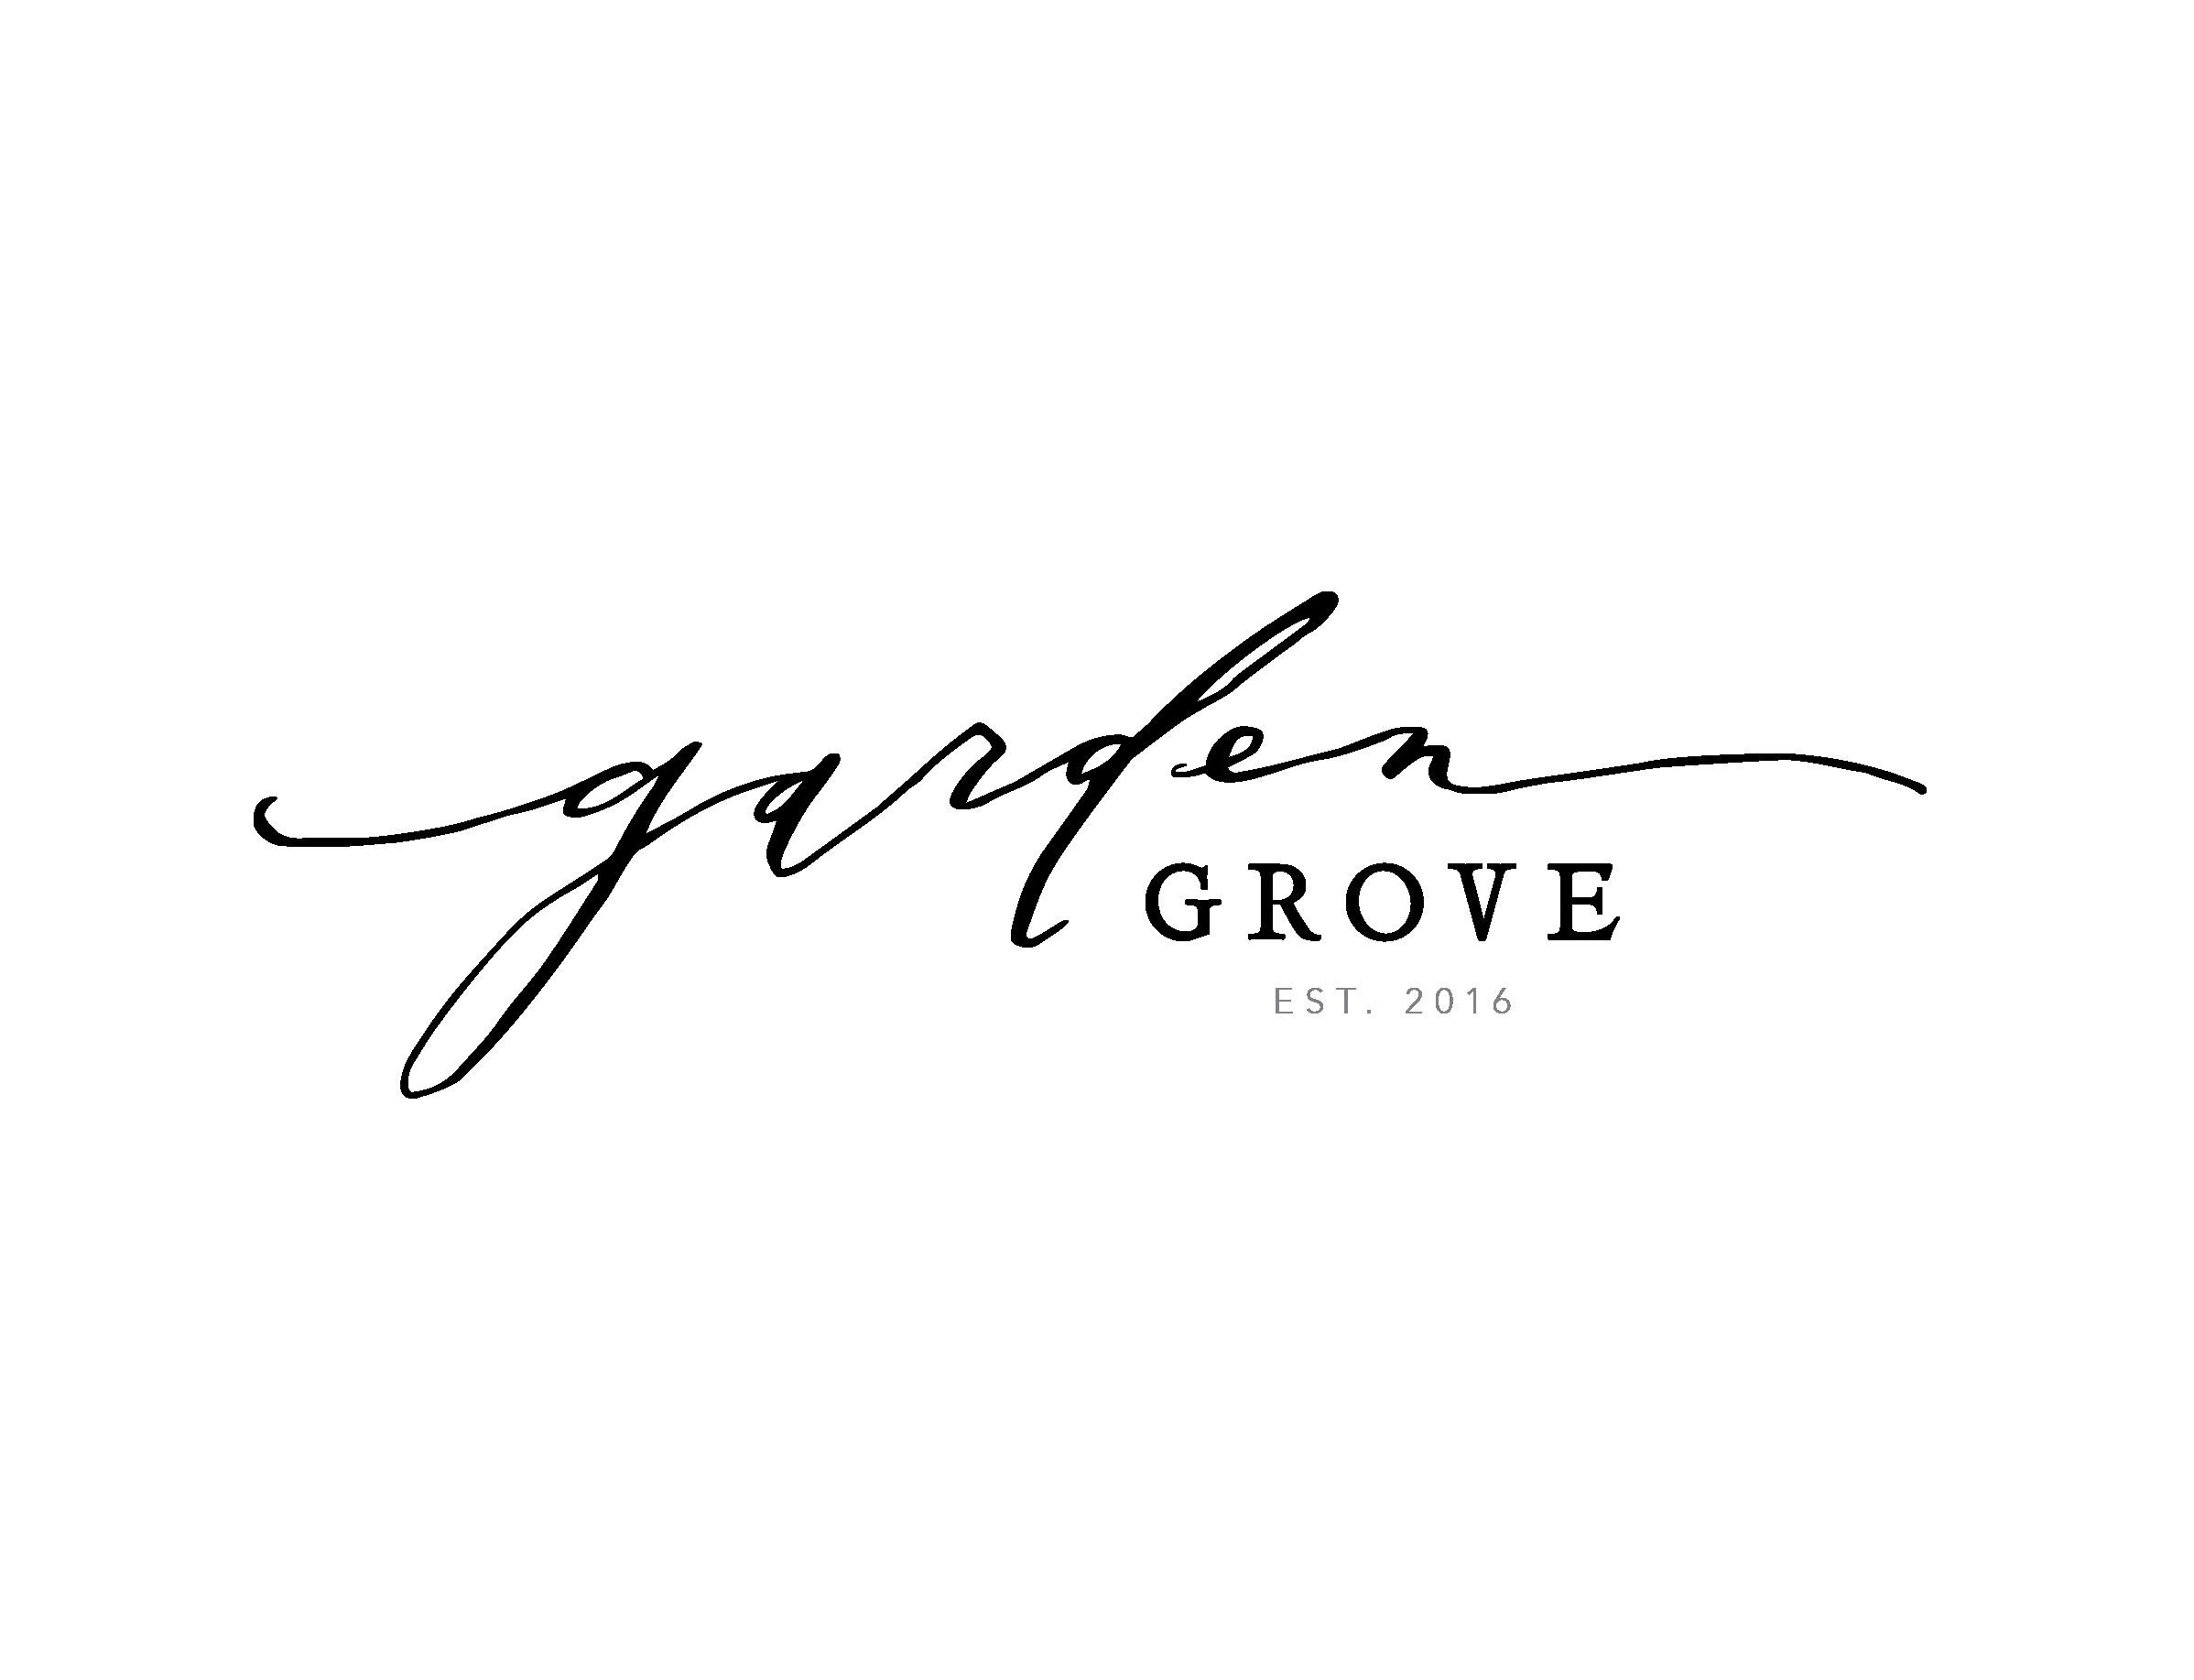 GardenGrove_Logo_d3-01.png